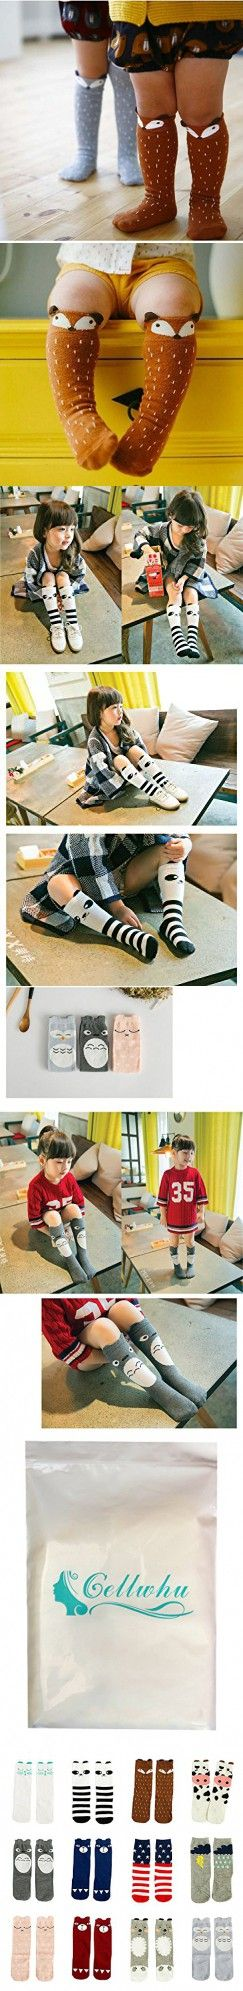 Gellwhu 12 Pairs Baby Girls Boys Cartoon Knee High Stockings Tube Socks 1-5Y (0-1 Year, 12 Pairs Set A)